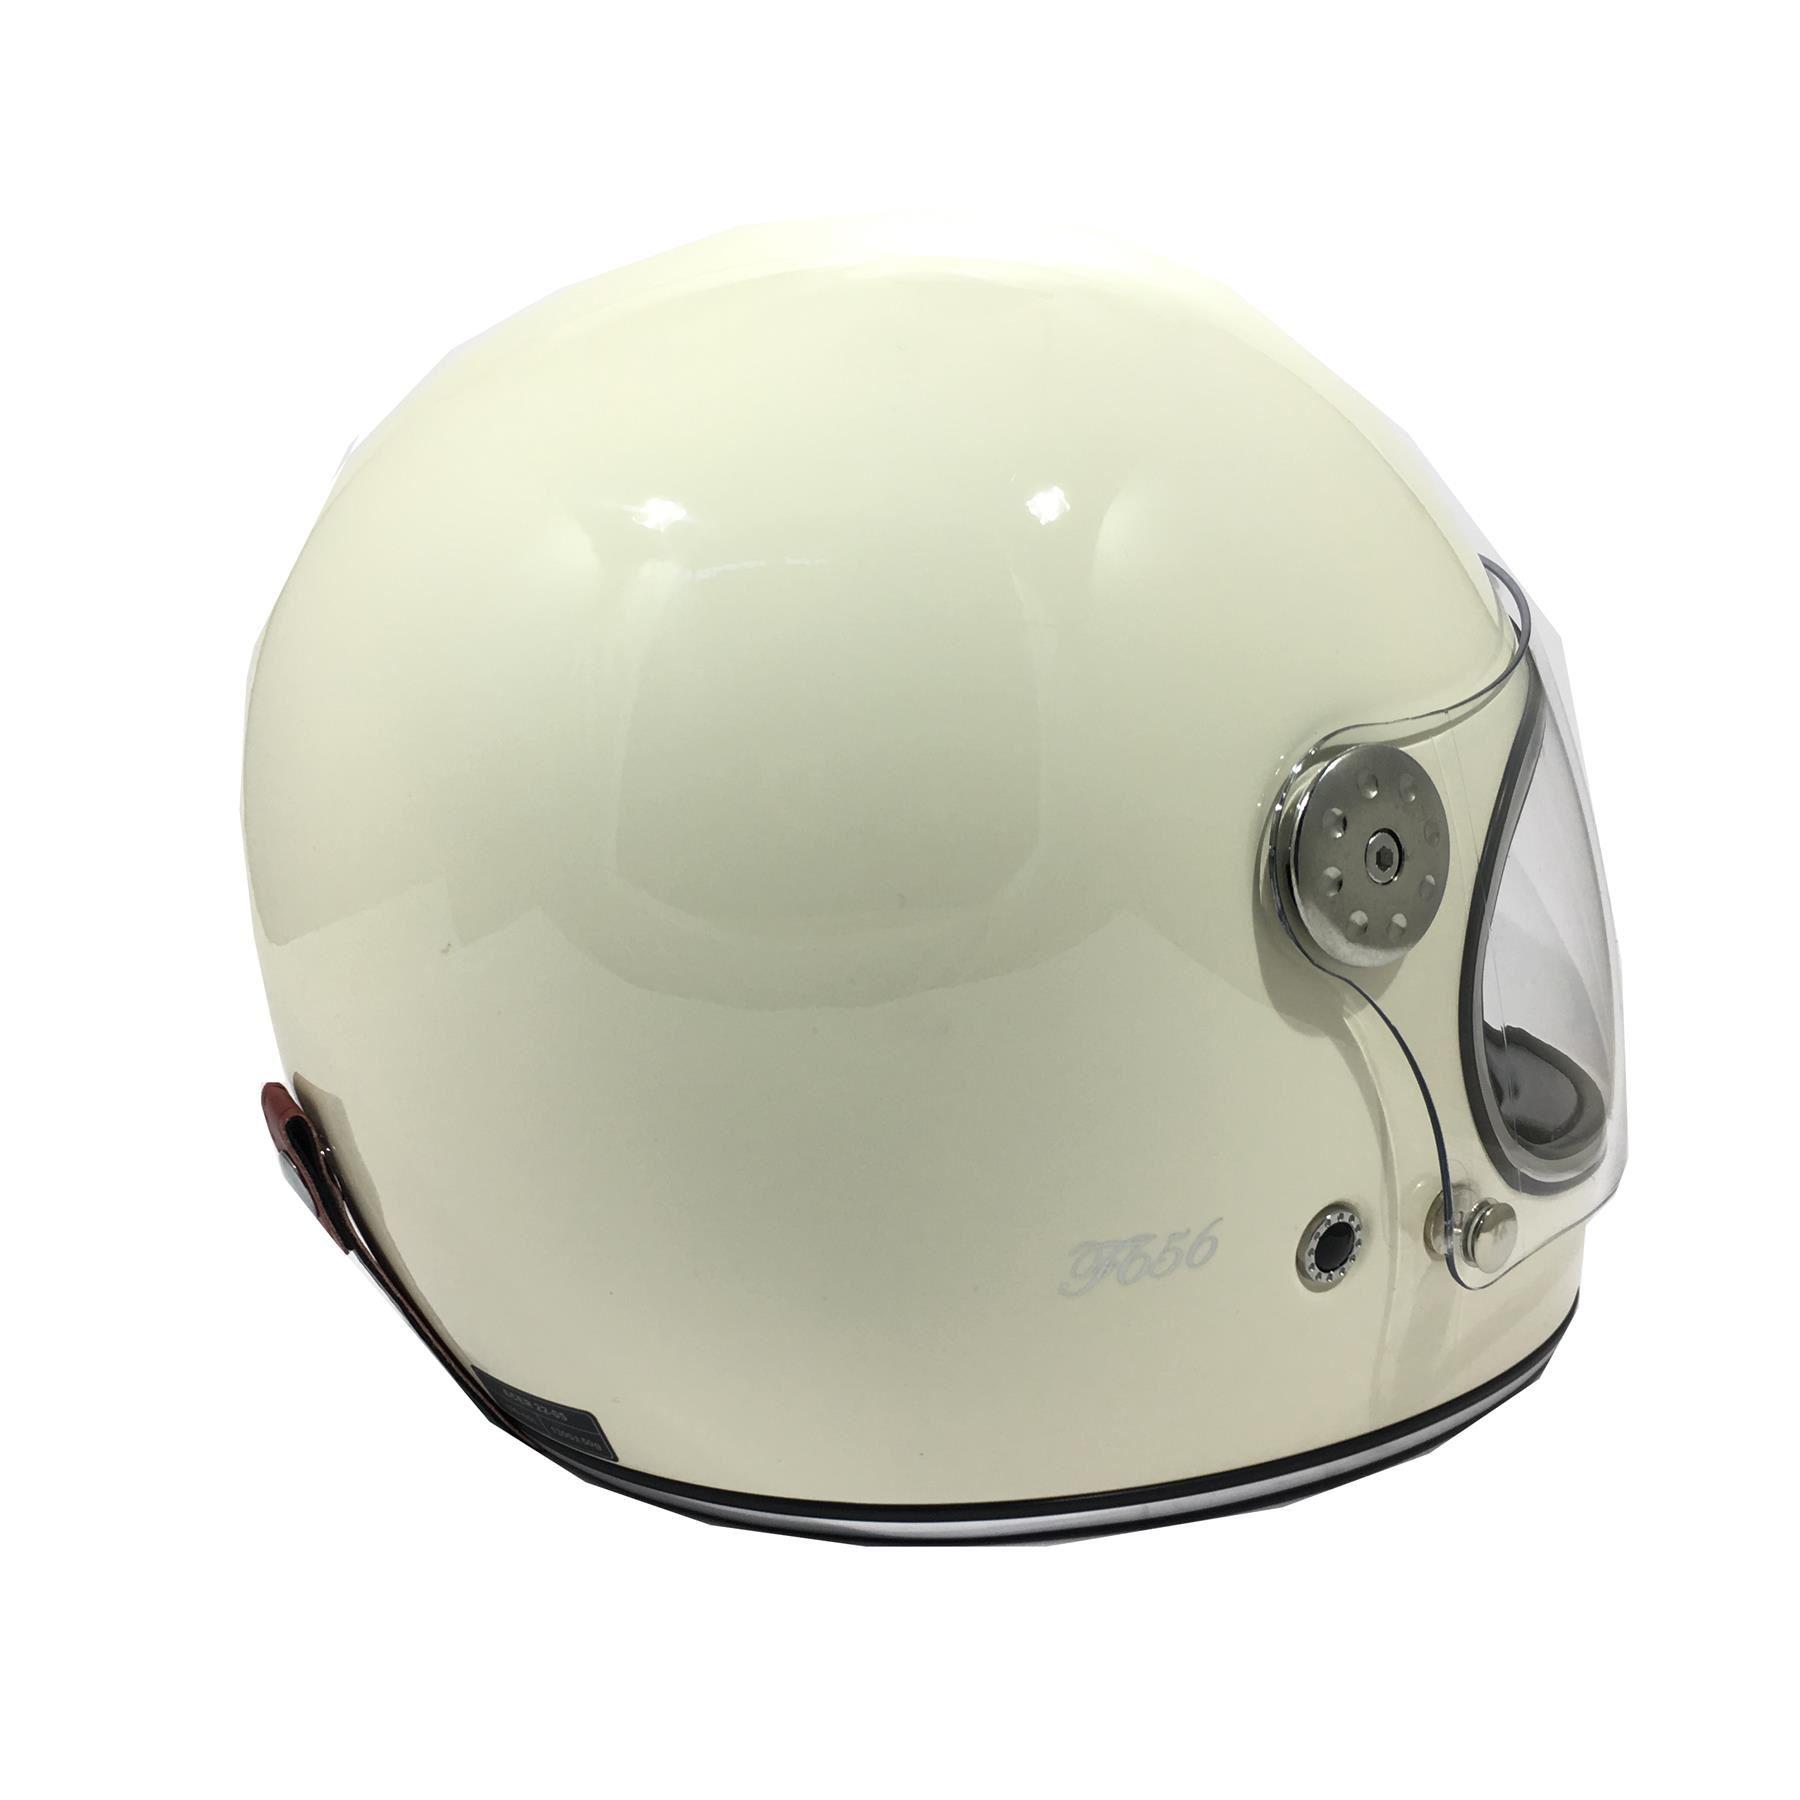 Viper-F656-Retro-Vintage-FibreGlass-Full-Face-Motorcycle-Bike-Road-Crash-Helmet miniature 15